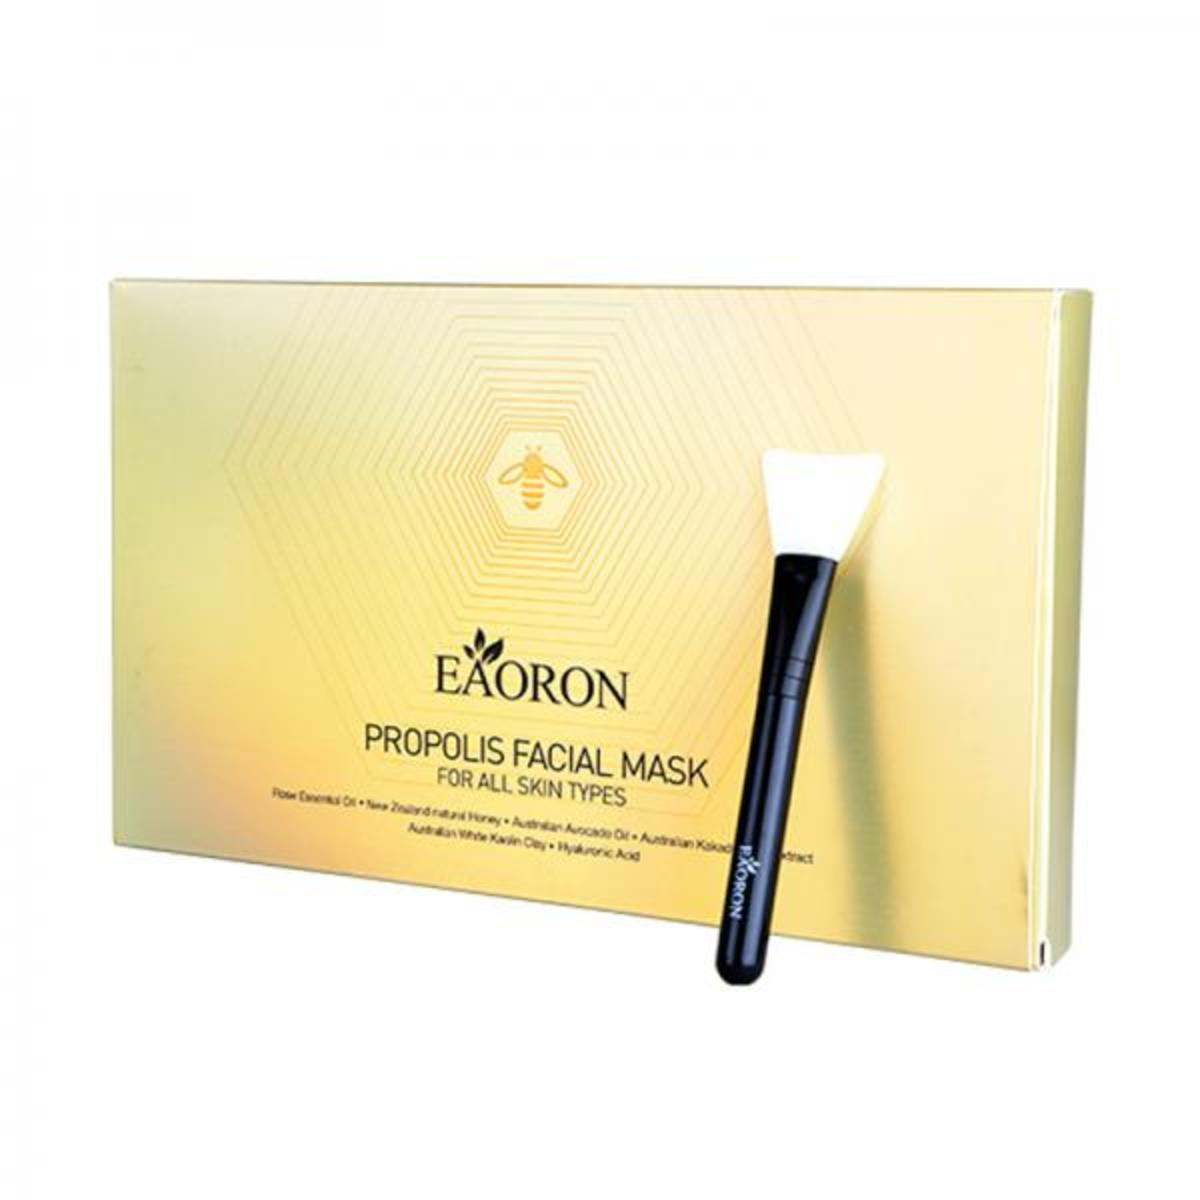 Propolis Facial Mask 10ml x 8pcs (9348107001591)